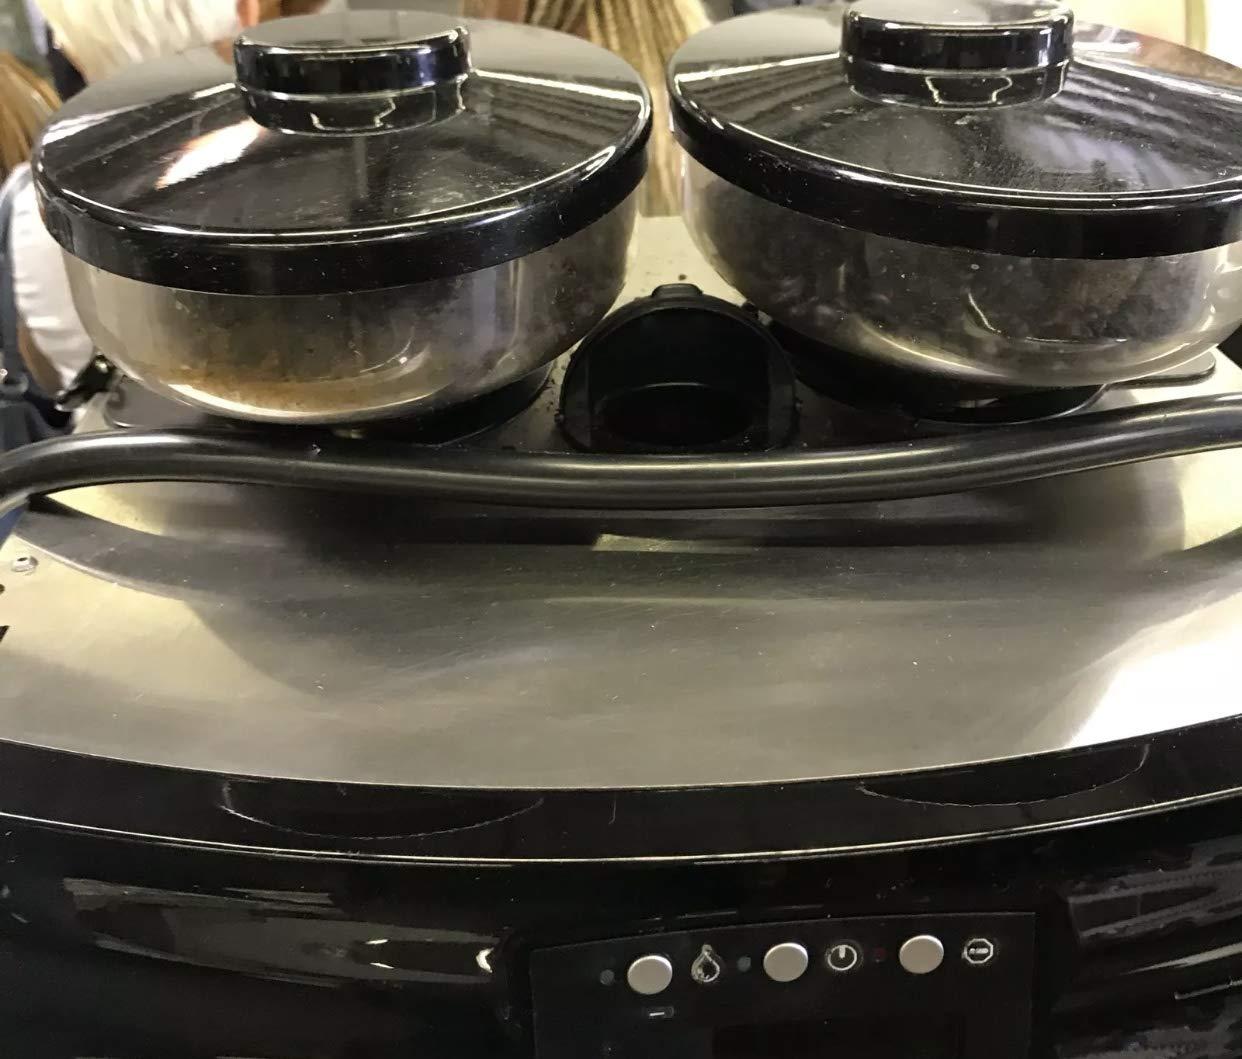 Amazon.com: Schaerer Coffee Art Plus Espresso Machine Model Cofeeartplus: Industrial & Scientific